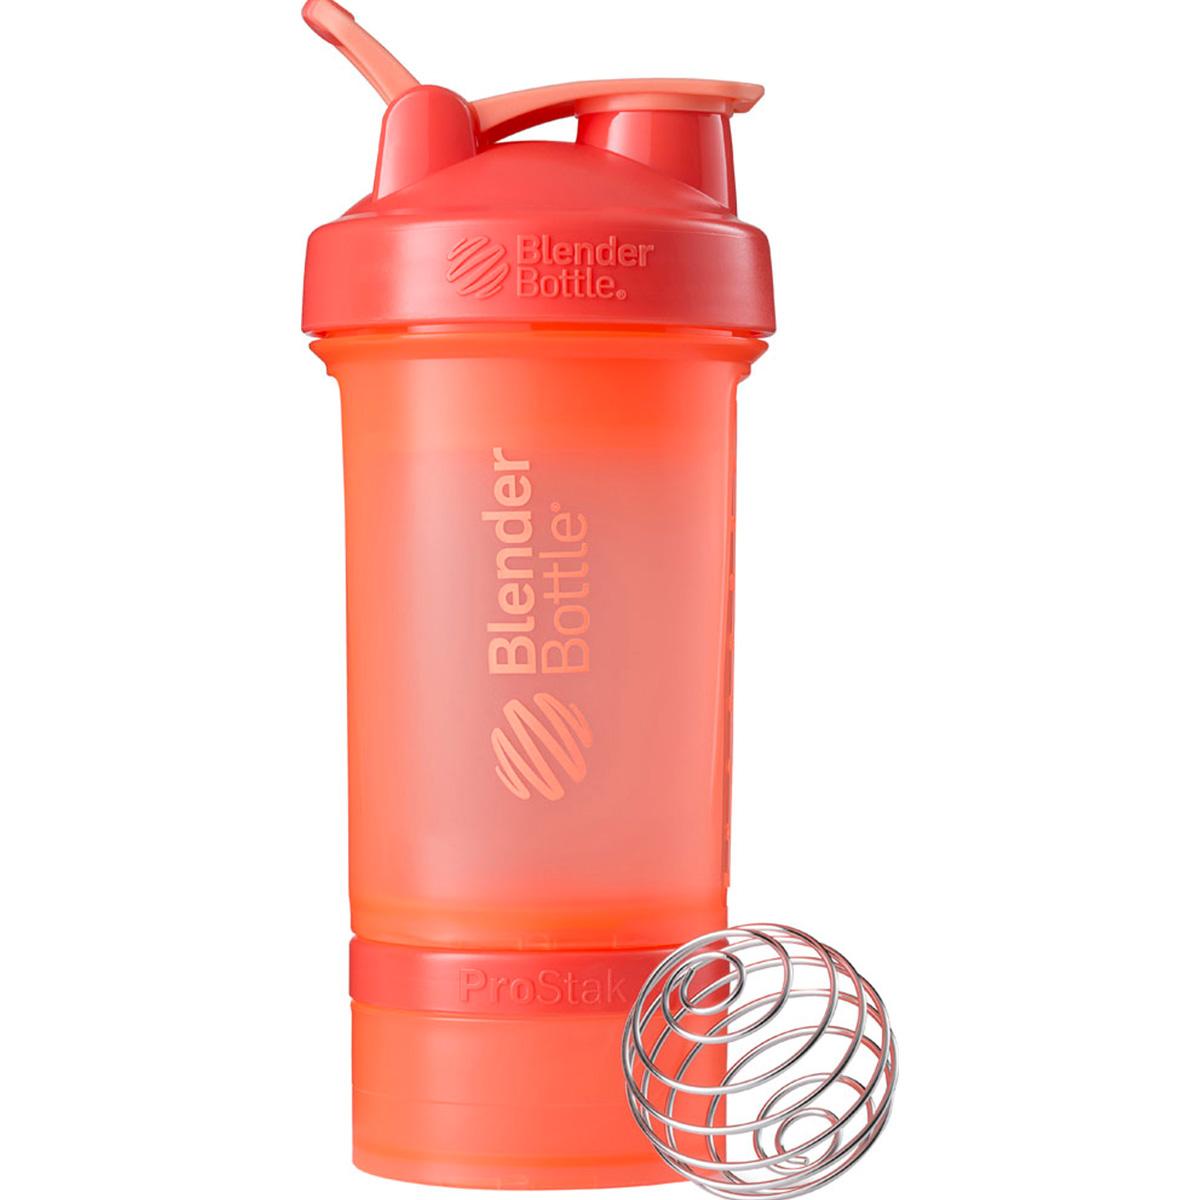 Blender Bottle ブレンダーボトル プロテイン シェイカー ボトル スポーツミキサー 650ml プロスタック PROSTAK オレンジ BBPSE22